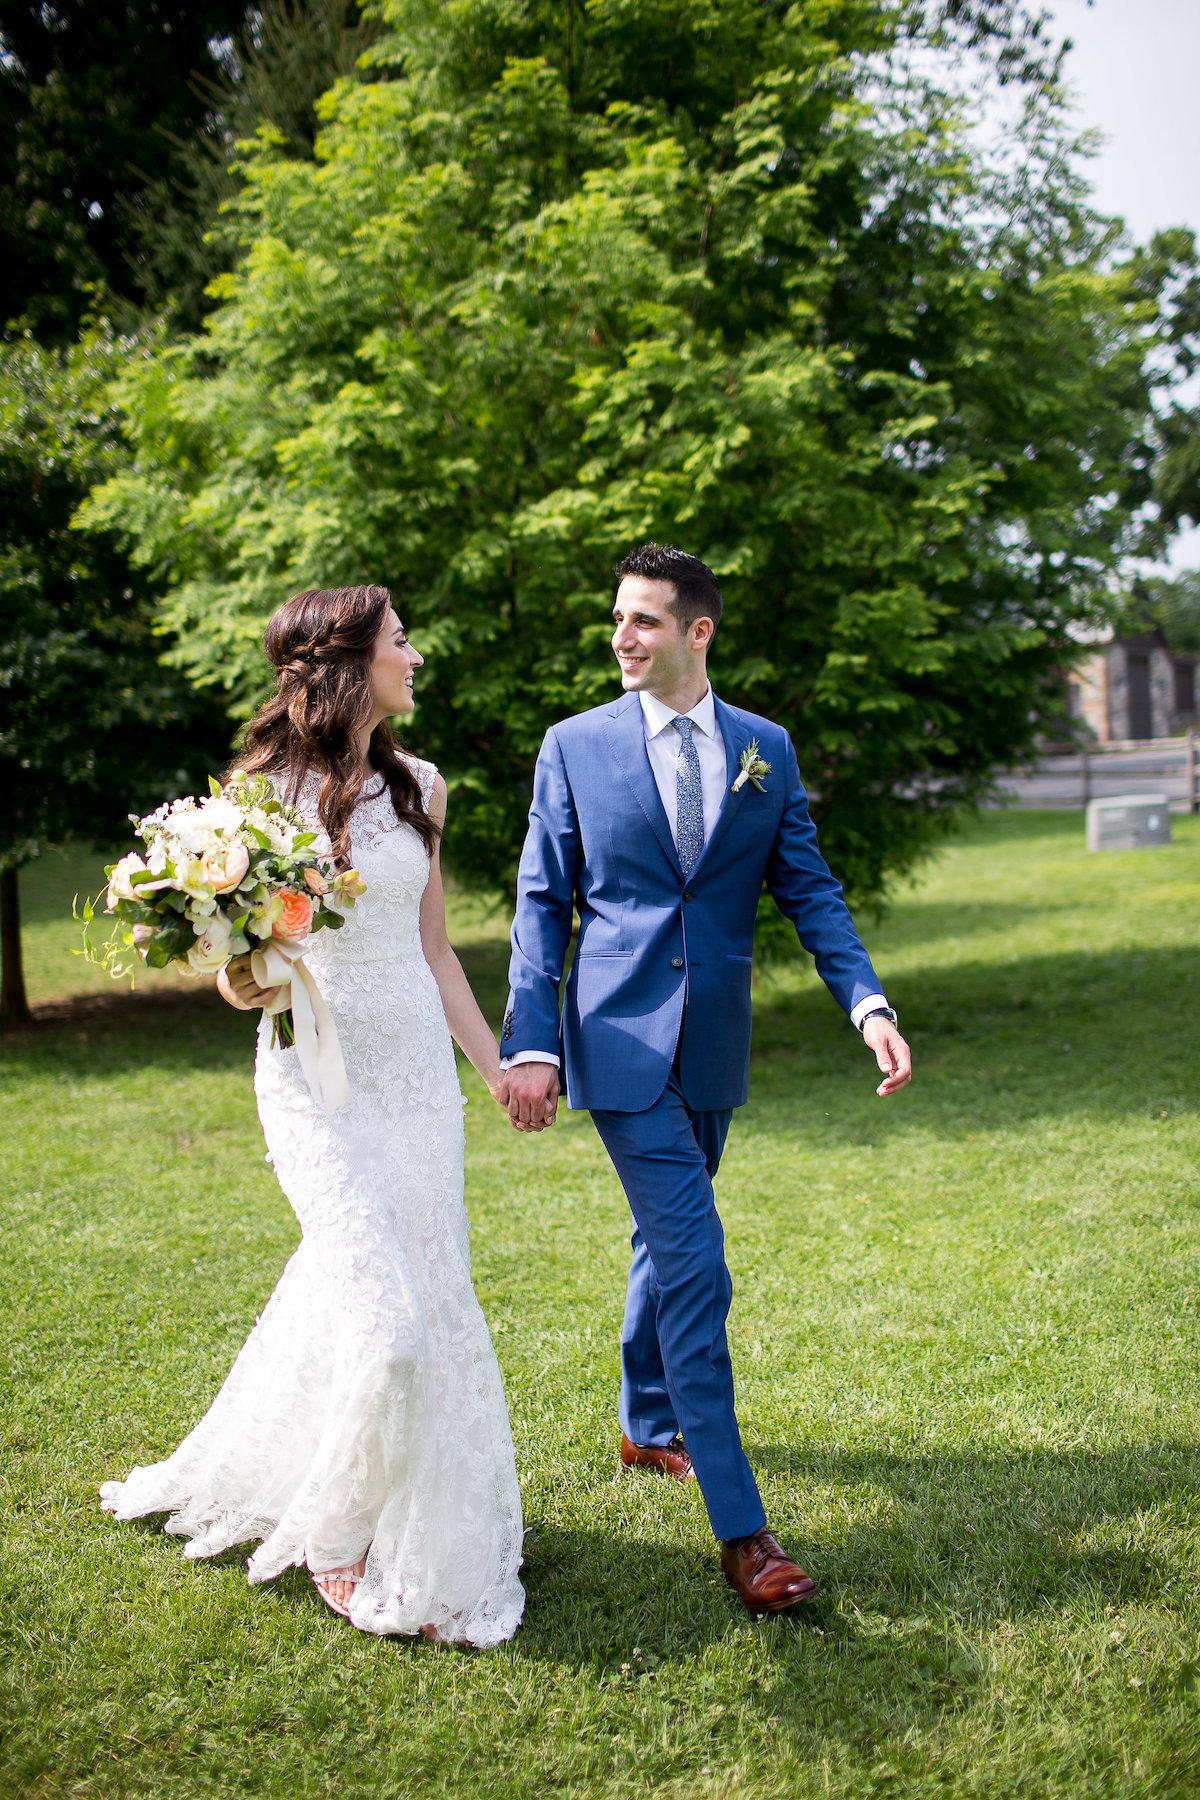 Summer Farm to Table Wedding - Denise Fasanello Flowers 26.jpg